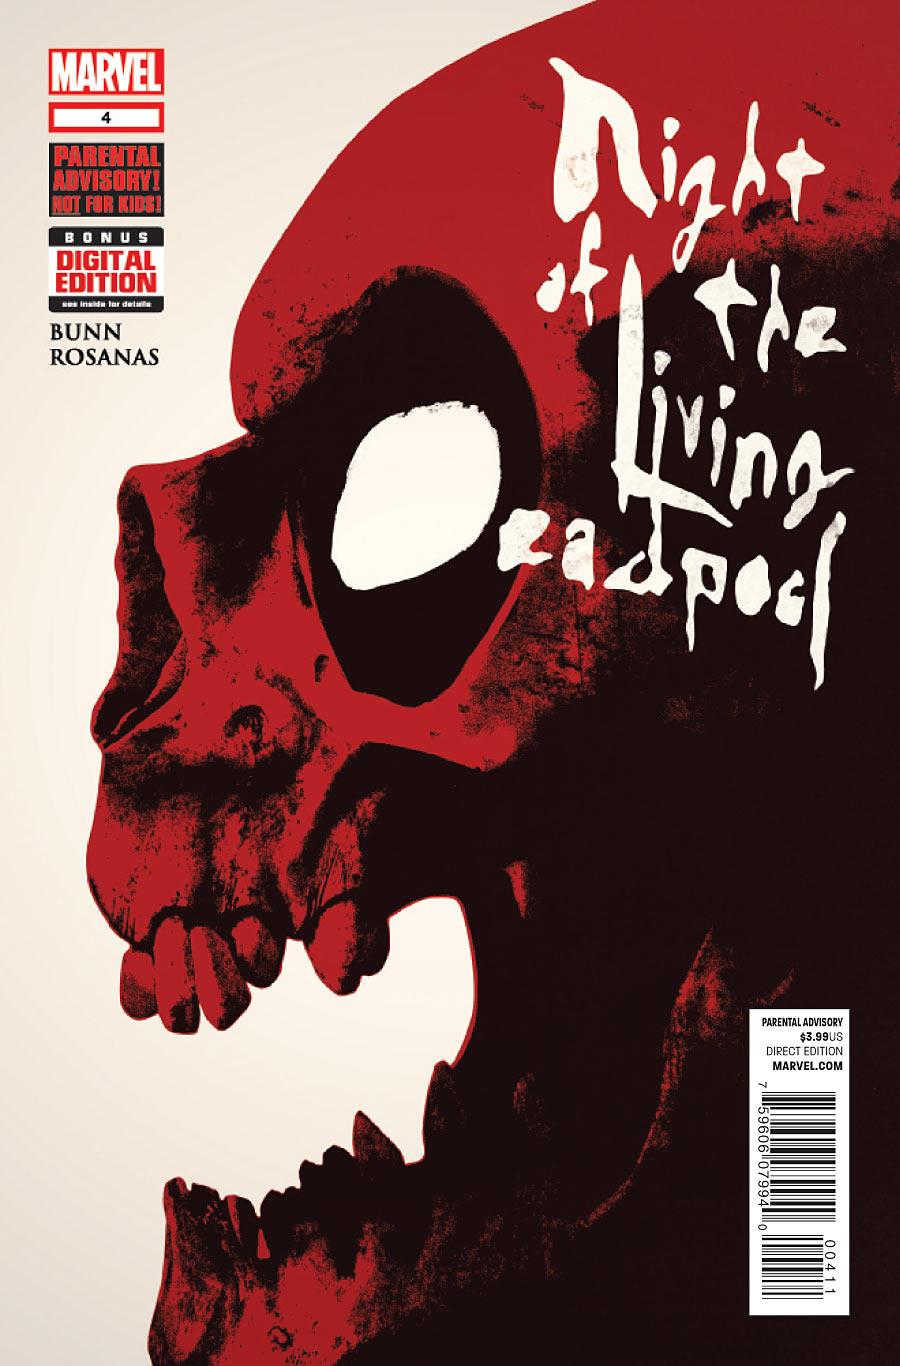 Night of the living deadpool descarga mega español